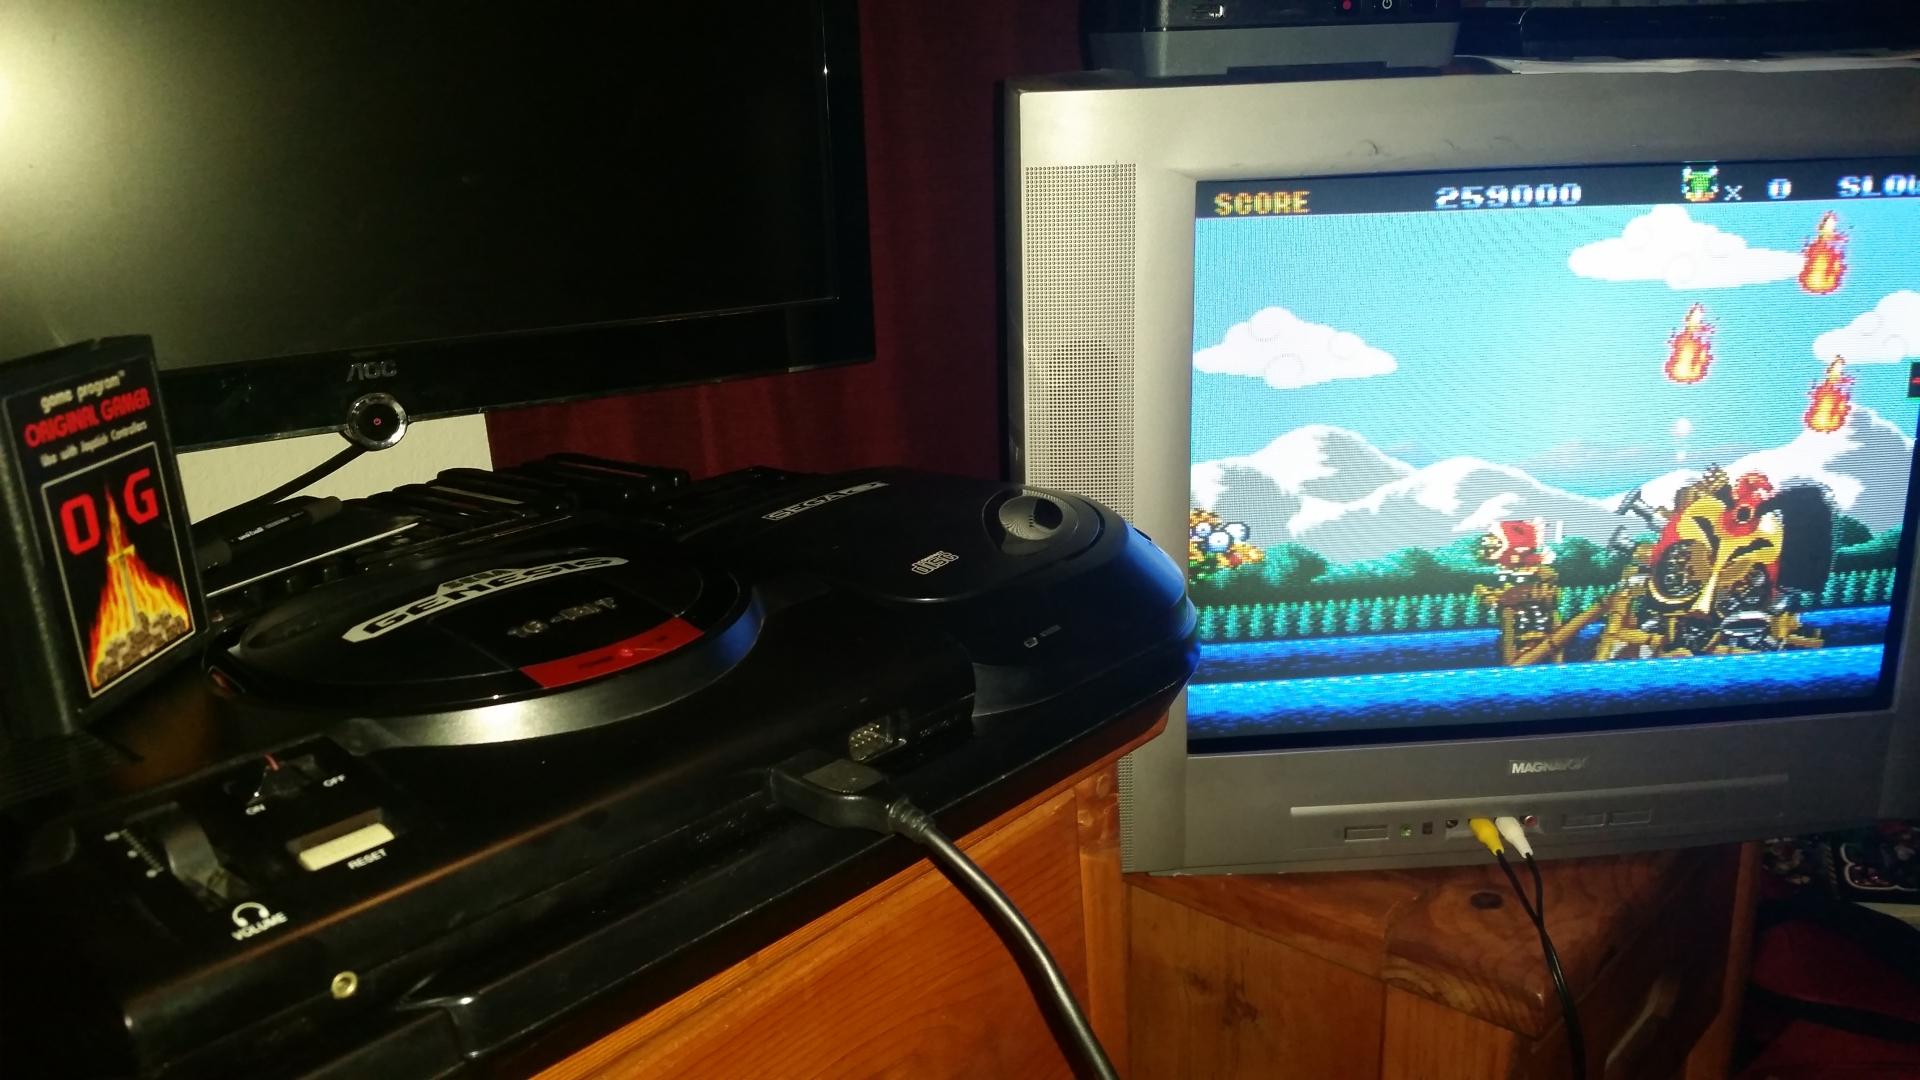 OriginalGamer: Keio Flying Squadron [easy] (Sega Genesis / MegaDrive) 259,000 points on 2016-10-18 19:51:42